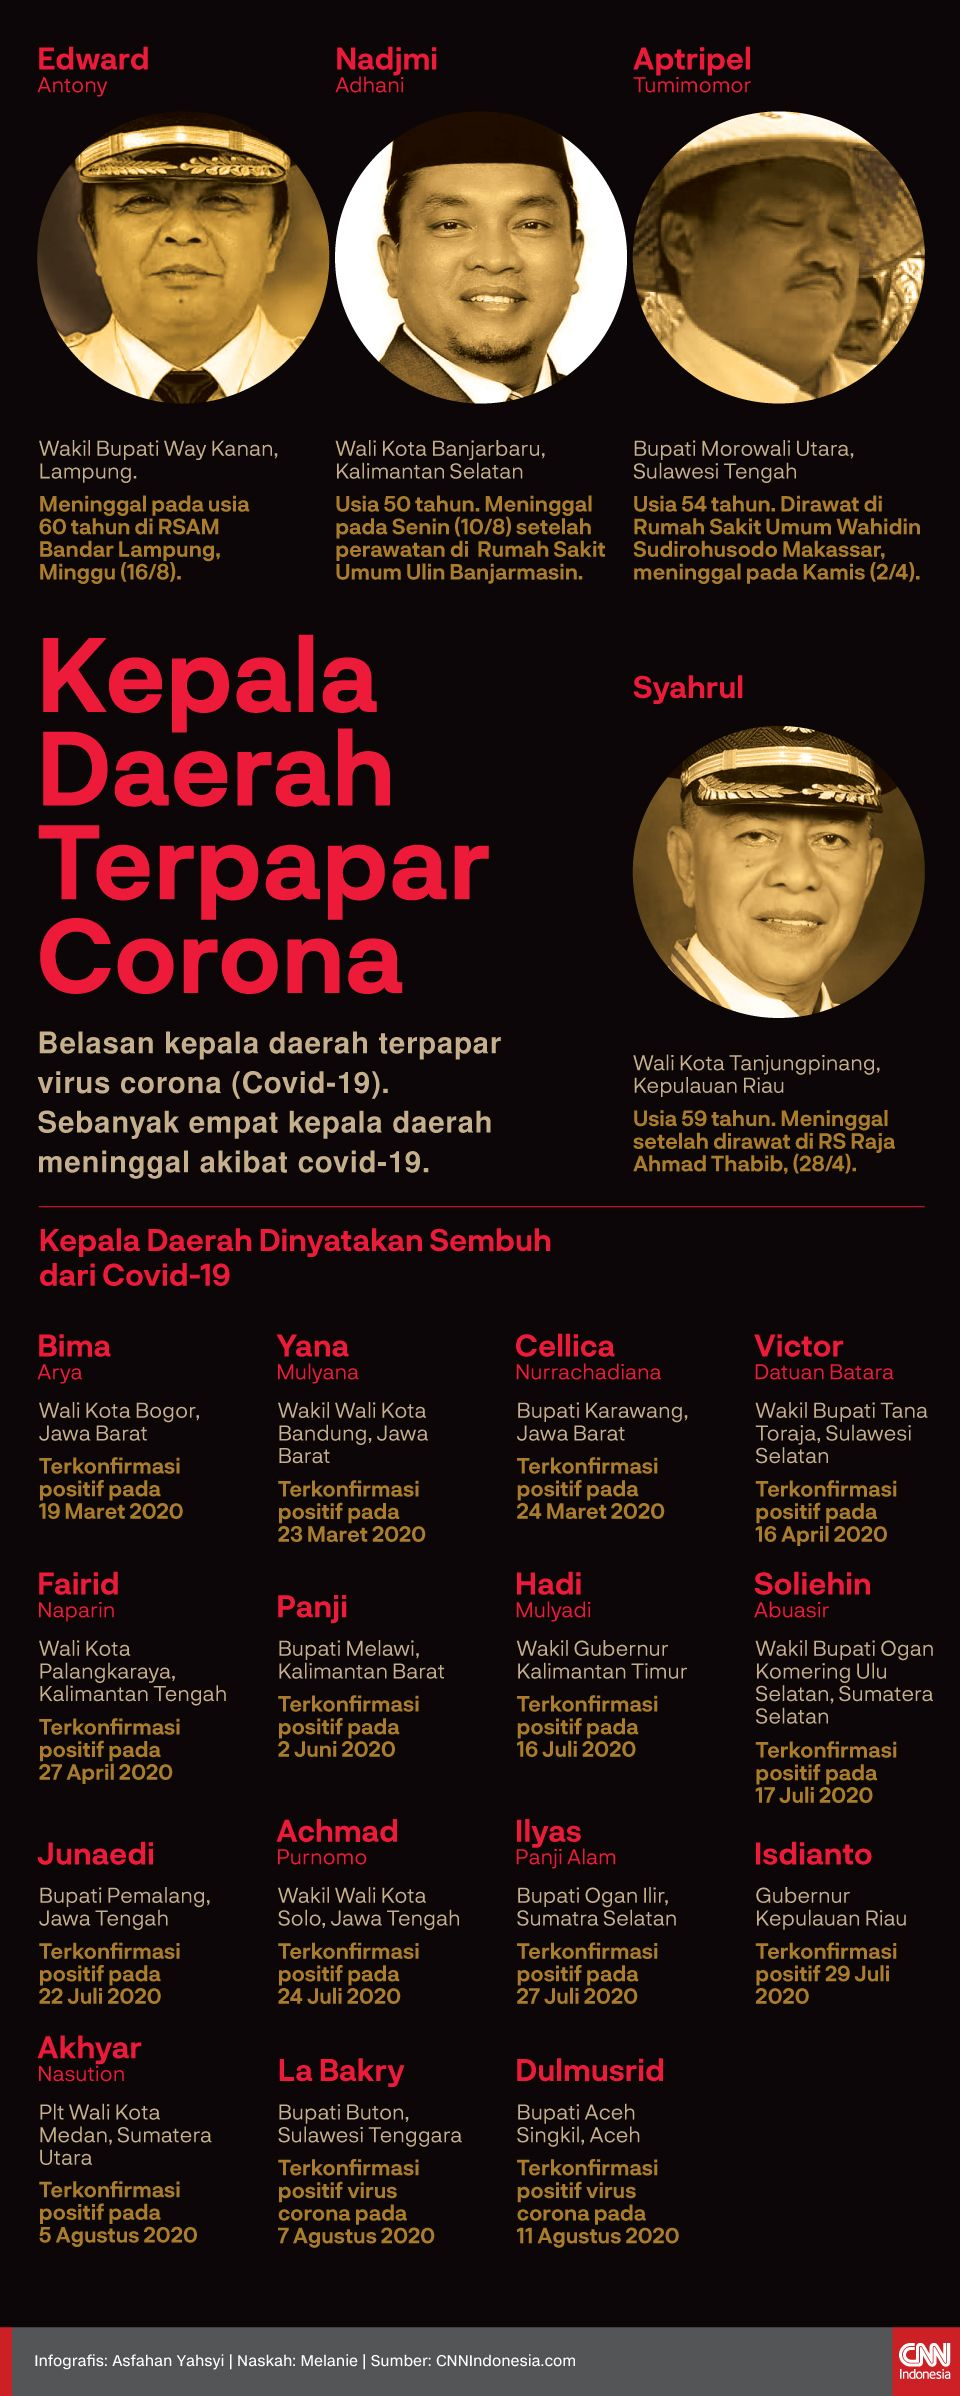 Infografis Kepala Daerah Terpapar Corona